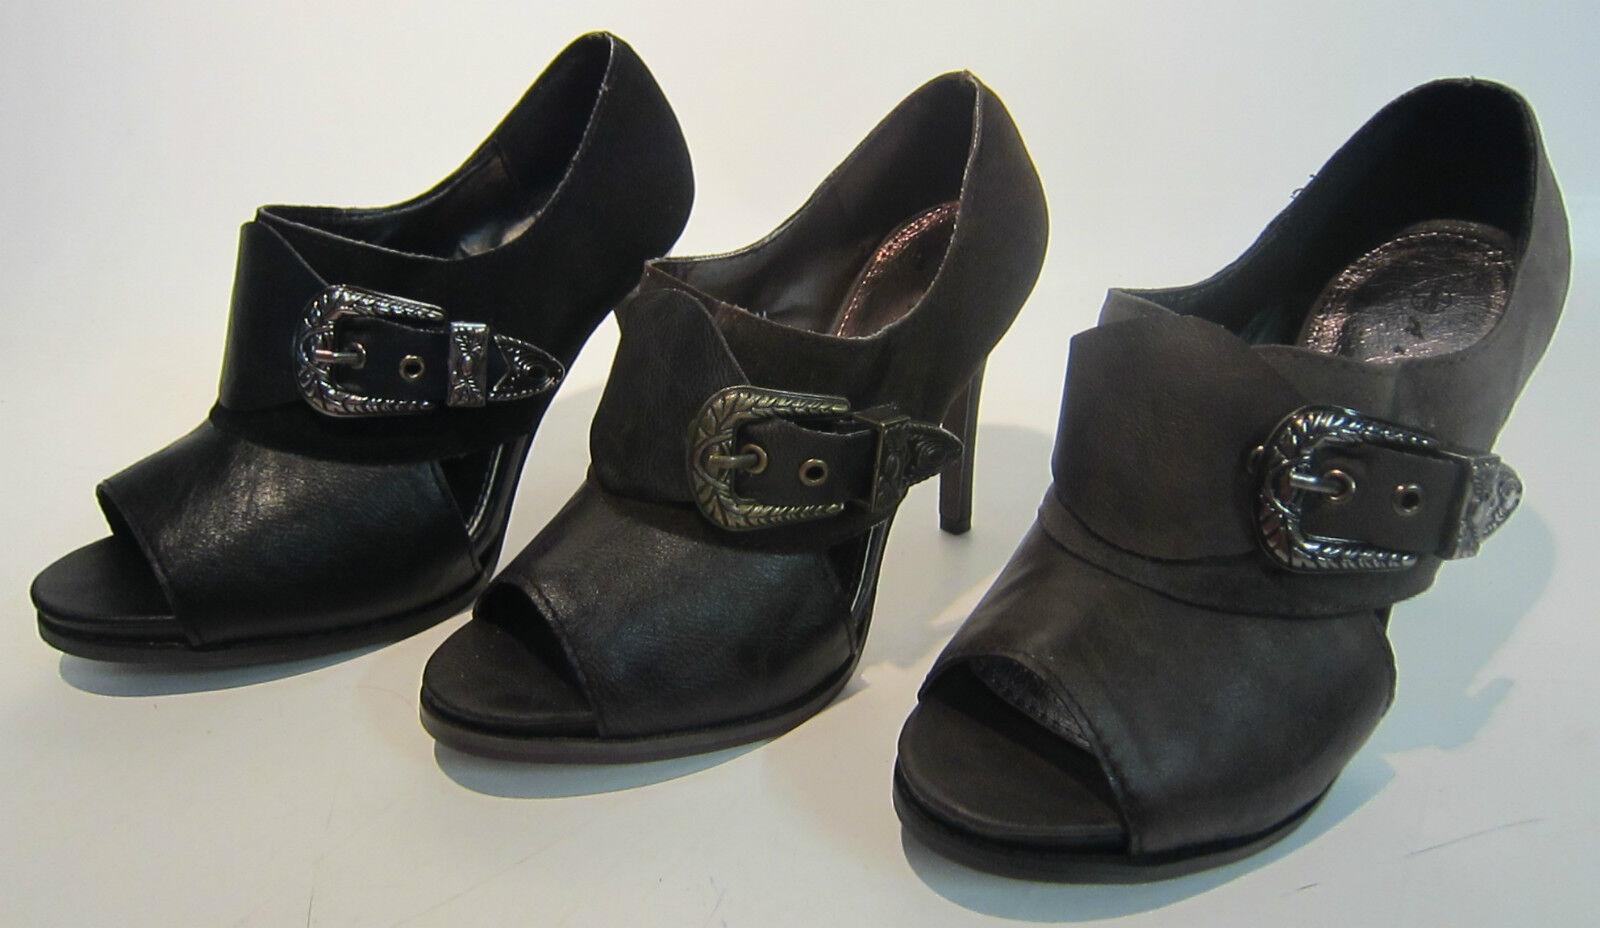 Moda jest prosta i niedroga L3992 - A & M Classic Stiefeletten - Peeptoe - Schnalle deatail